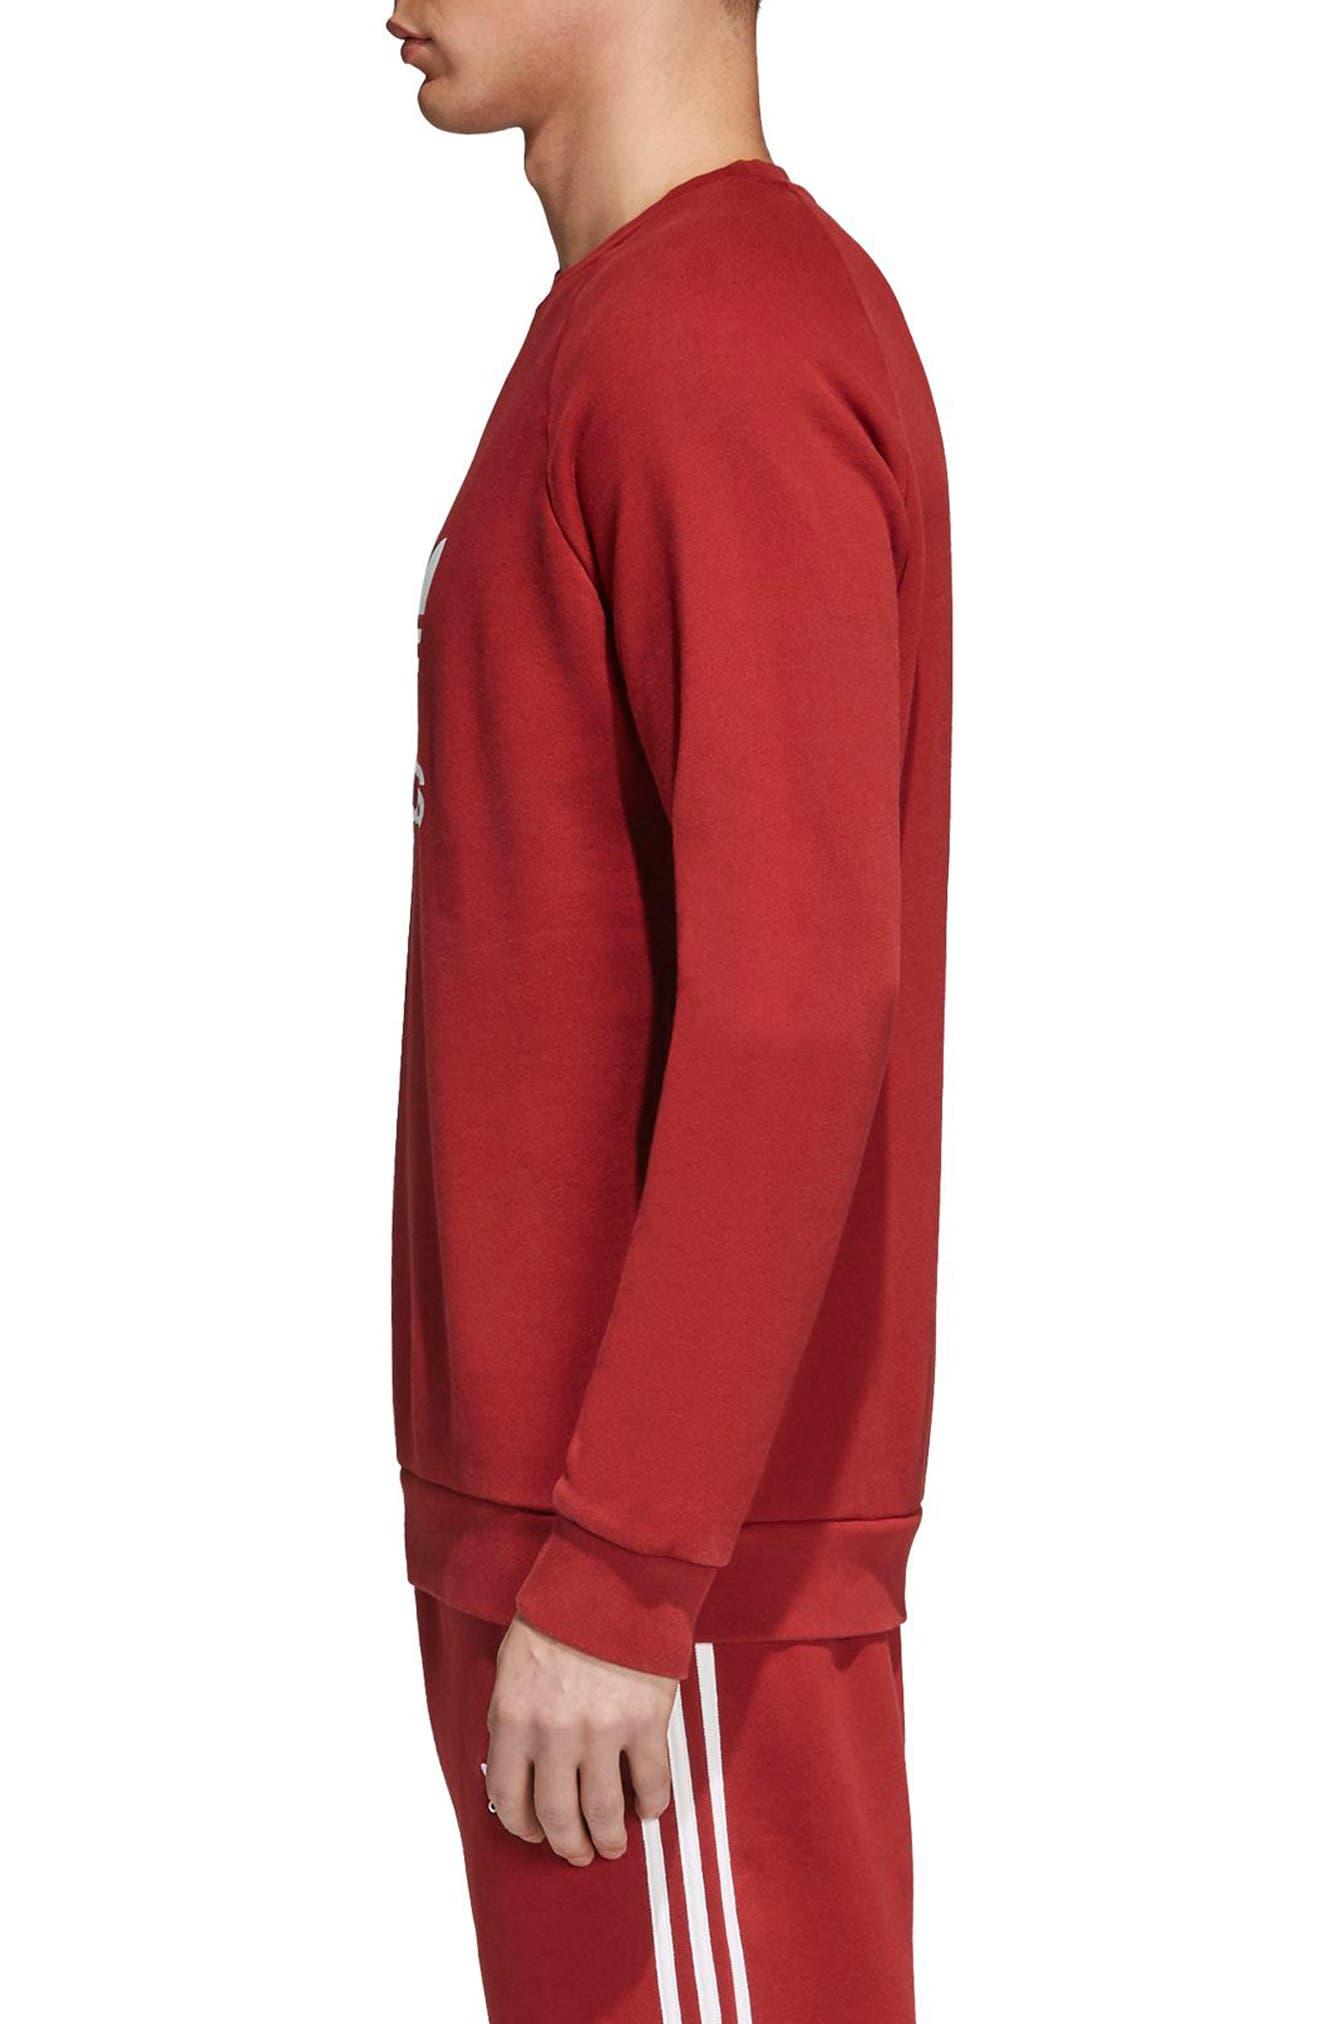 adidas Trefoil Crewneck Sweatshirt,                             Alternate thumbnail 4, color,                             Rusred